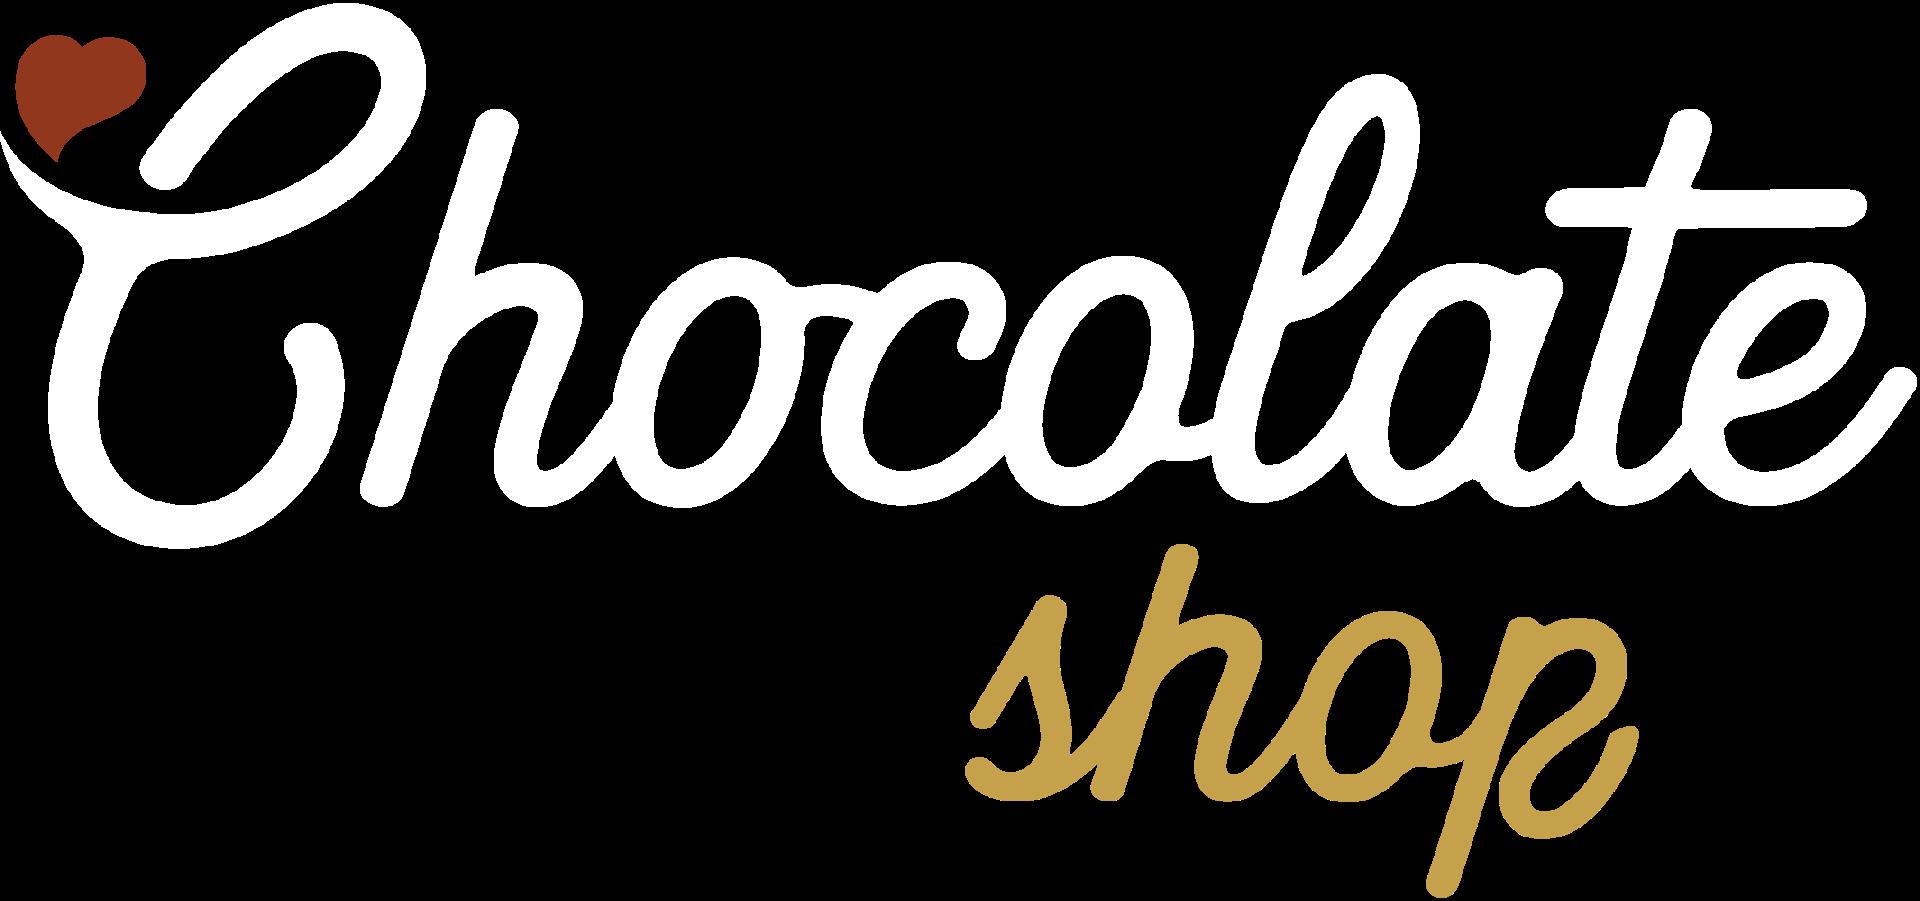 Chocolate Shop | Vendita online di cioccolato, cioccolatini e caramelle